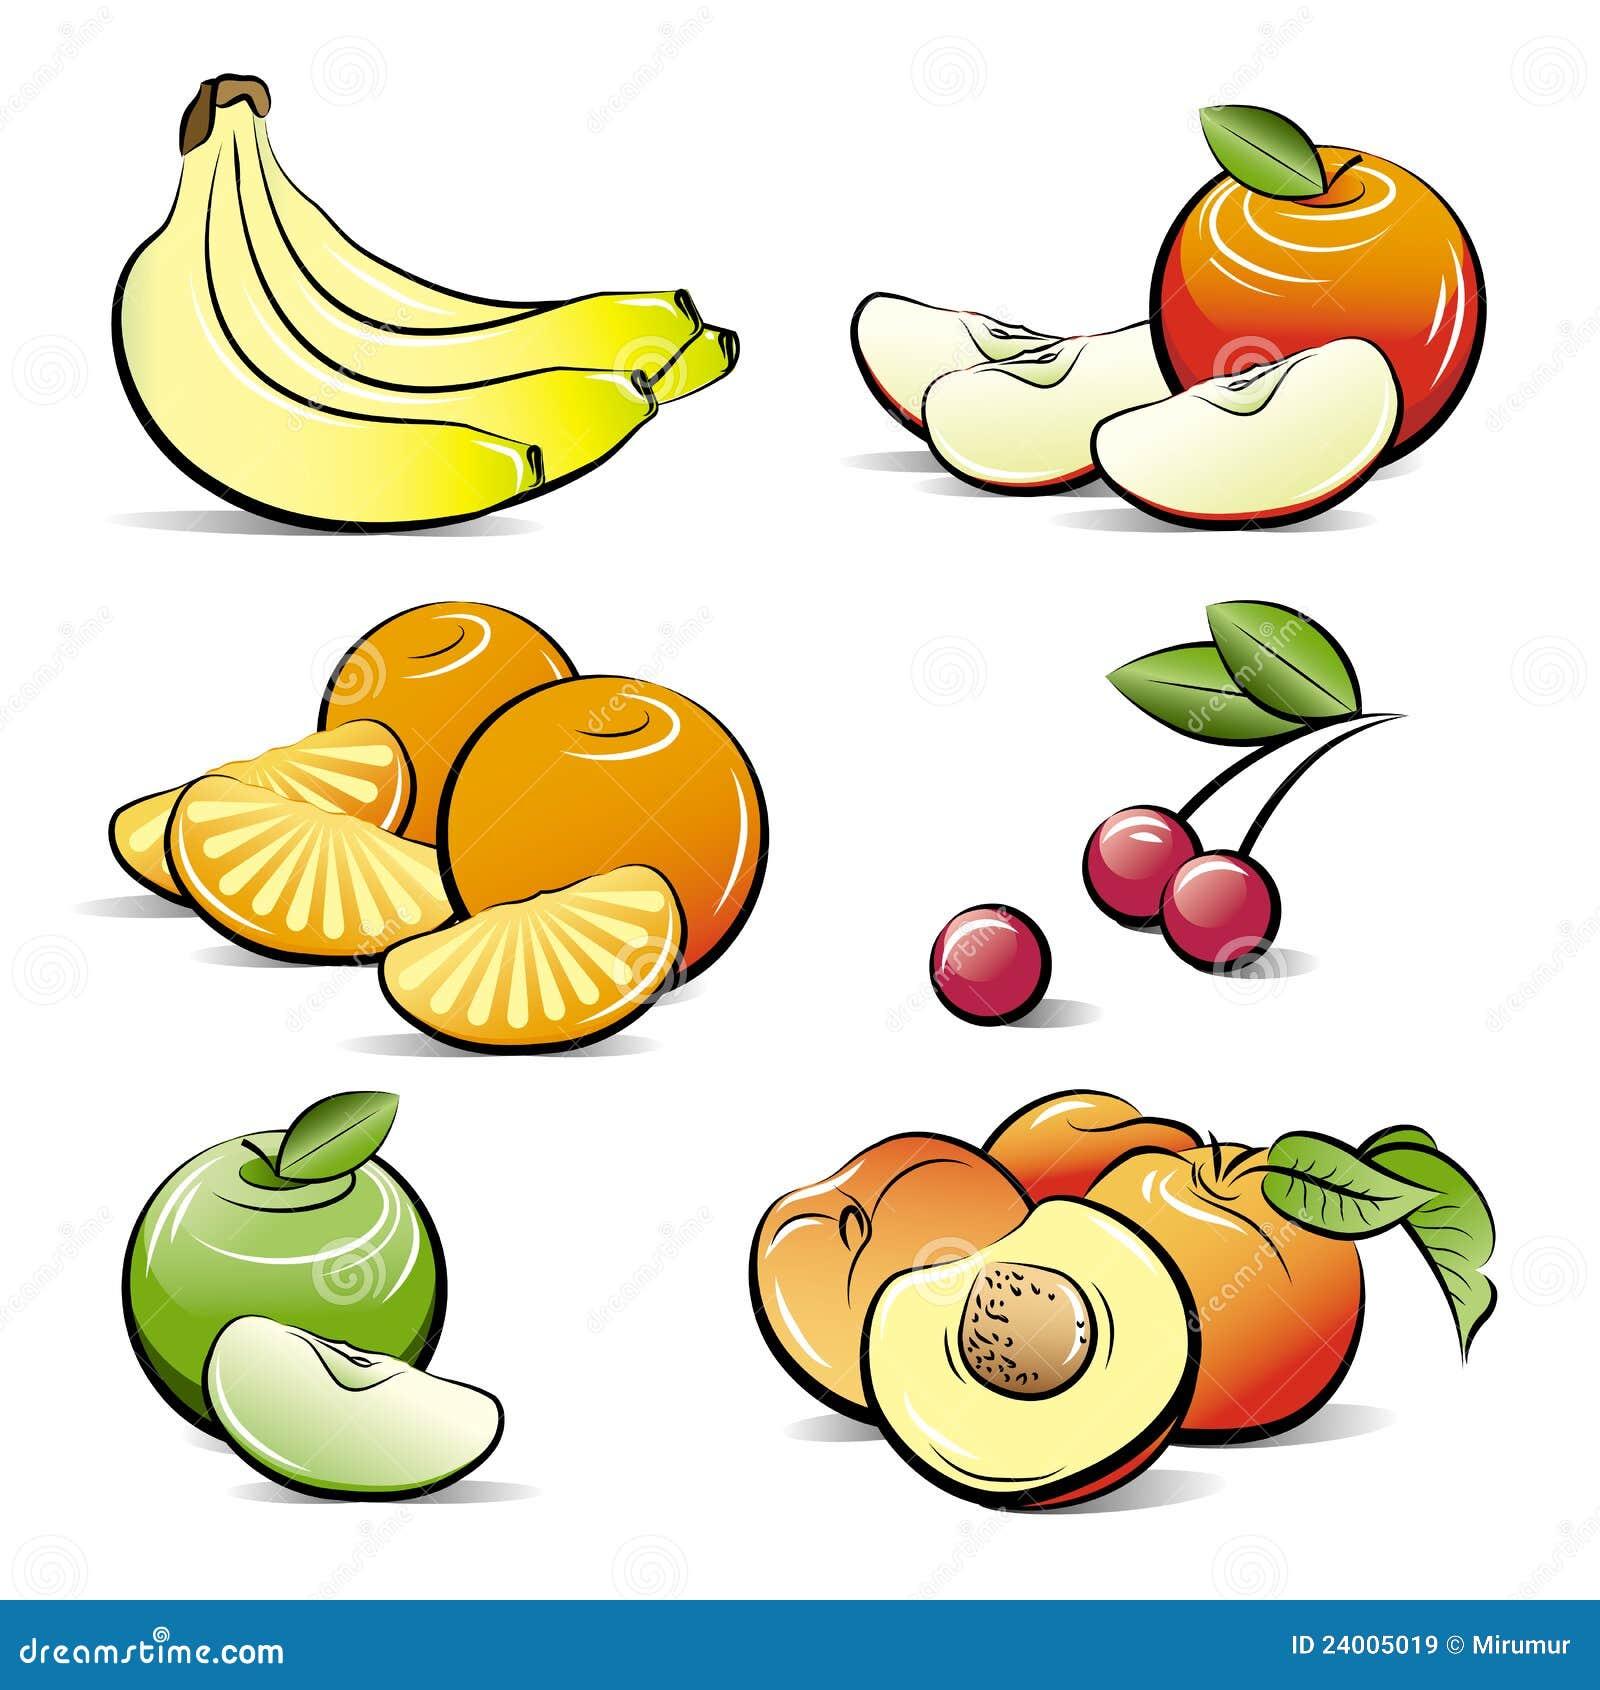 Dessin r gl de diff rents fruits de couleur illustration - Dessins fruits ...